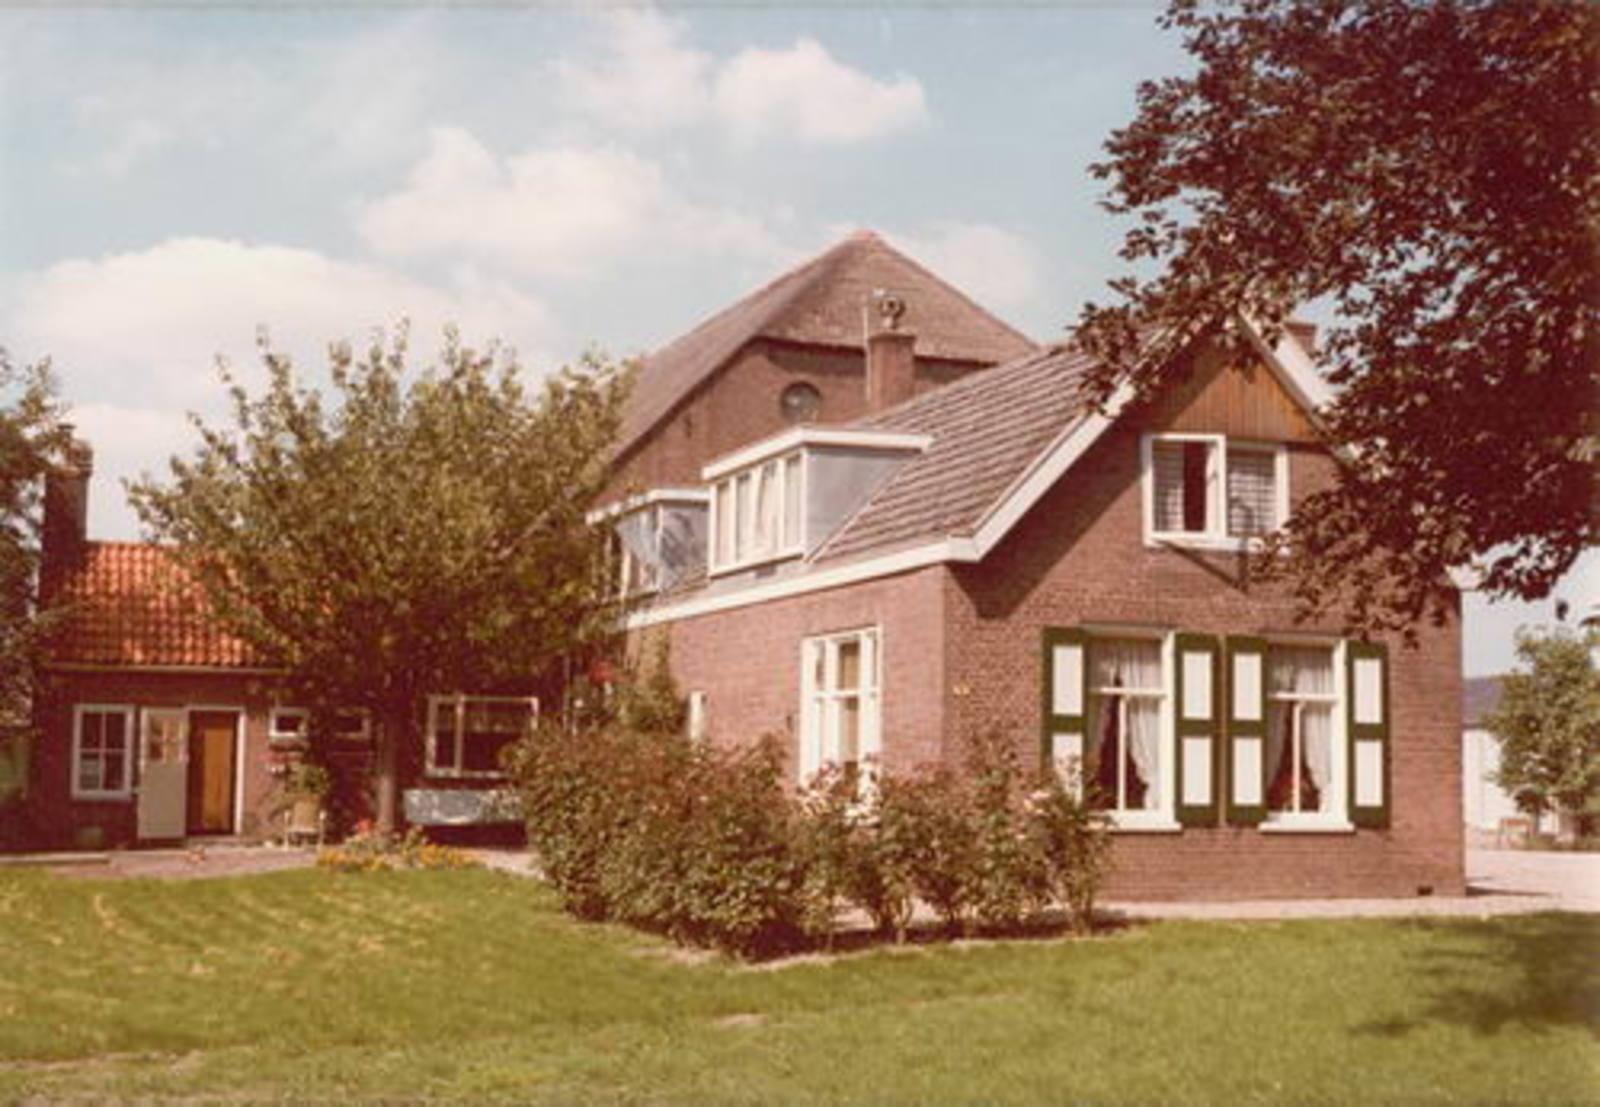 Rijnlanderweg W 0795 1977 sHertogenbosch